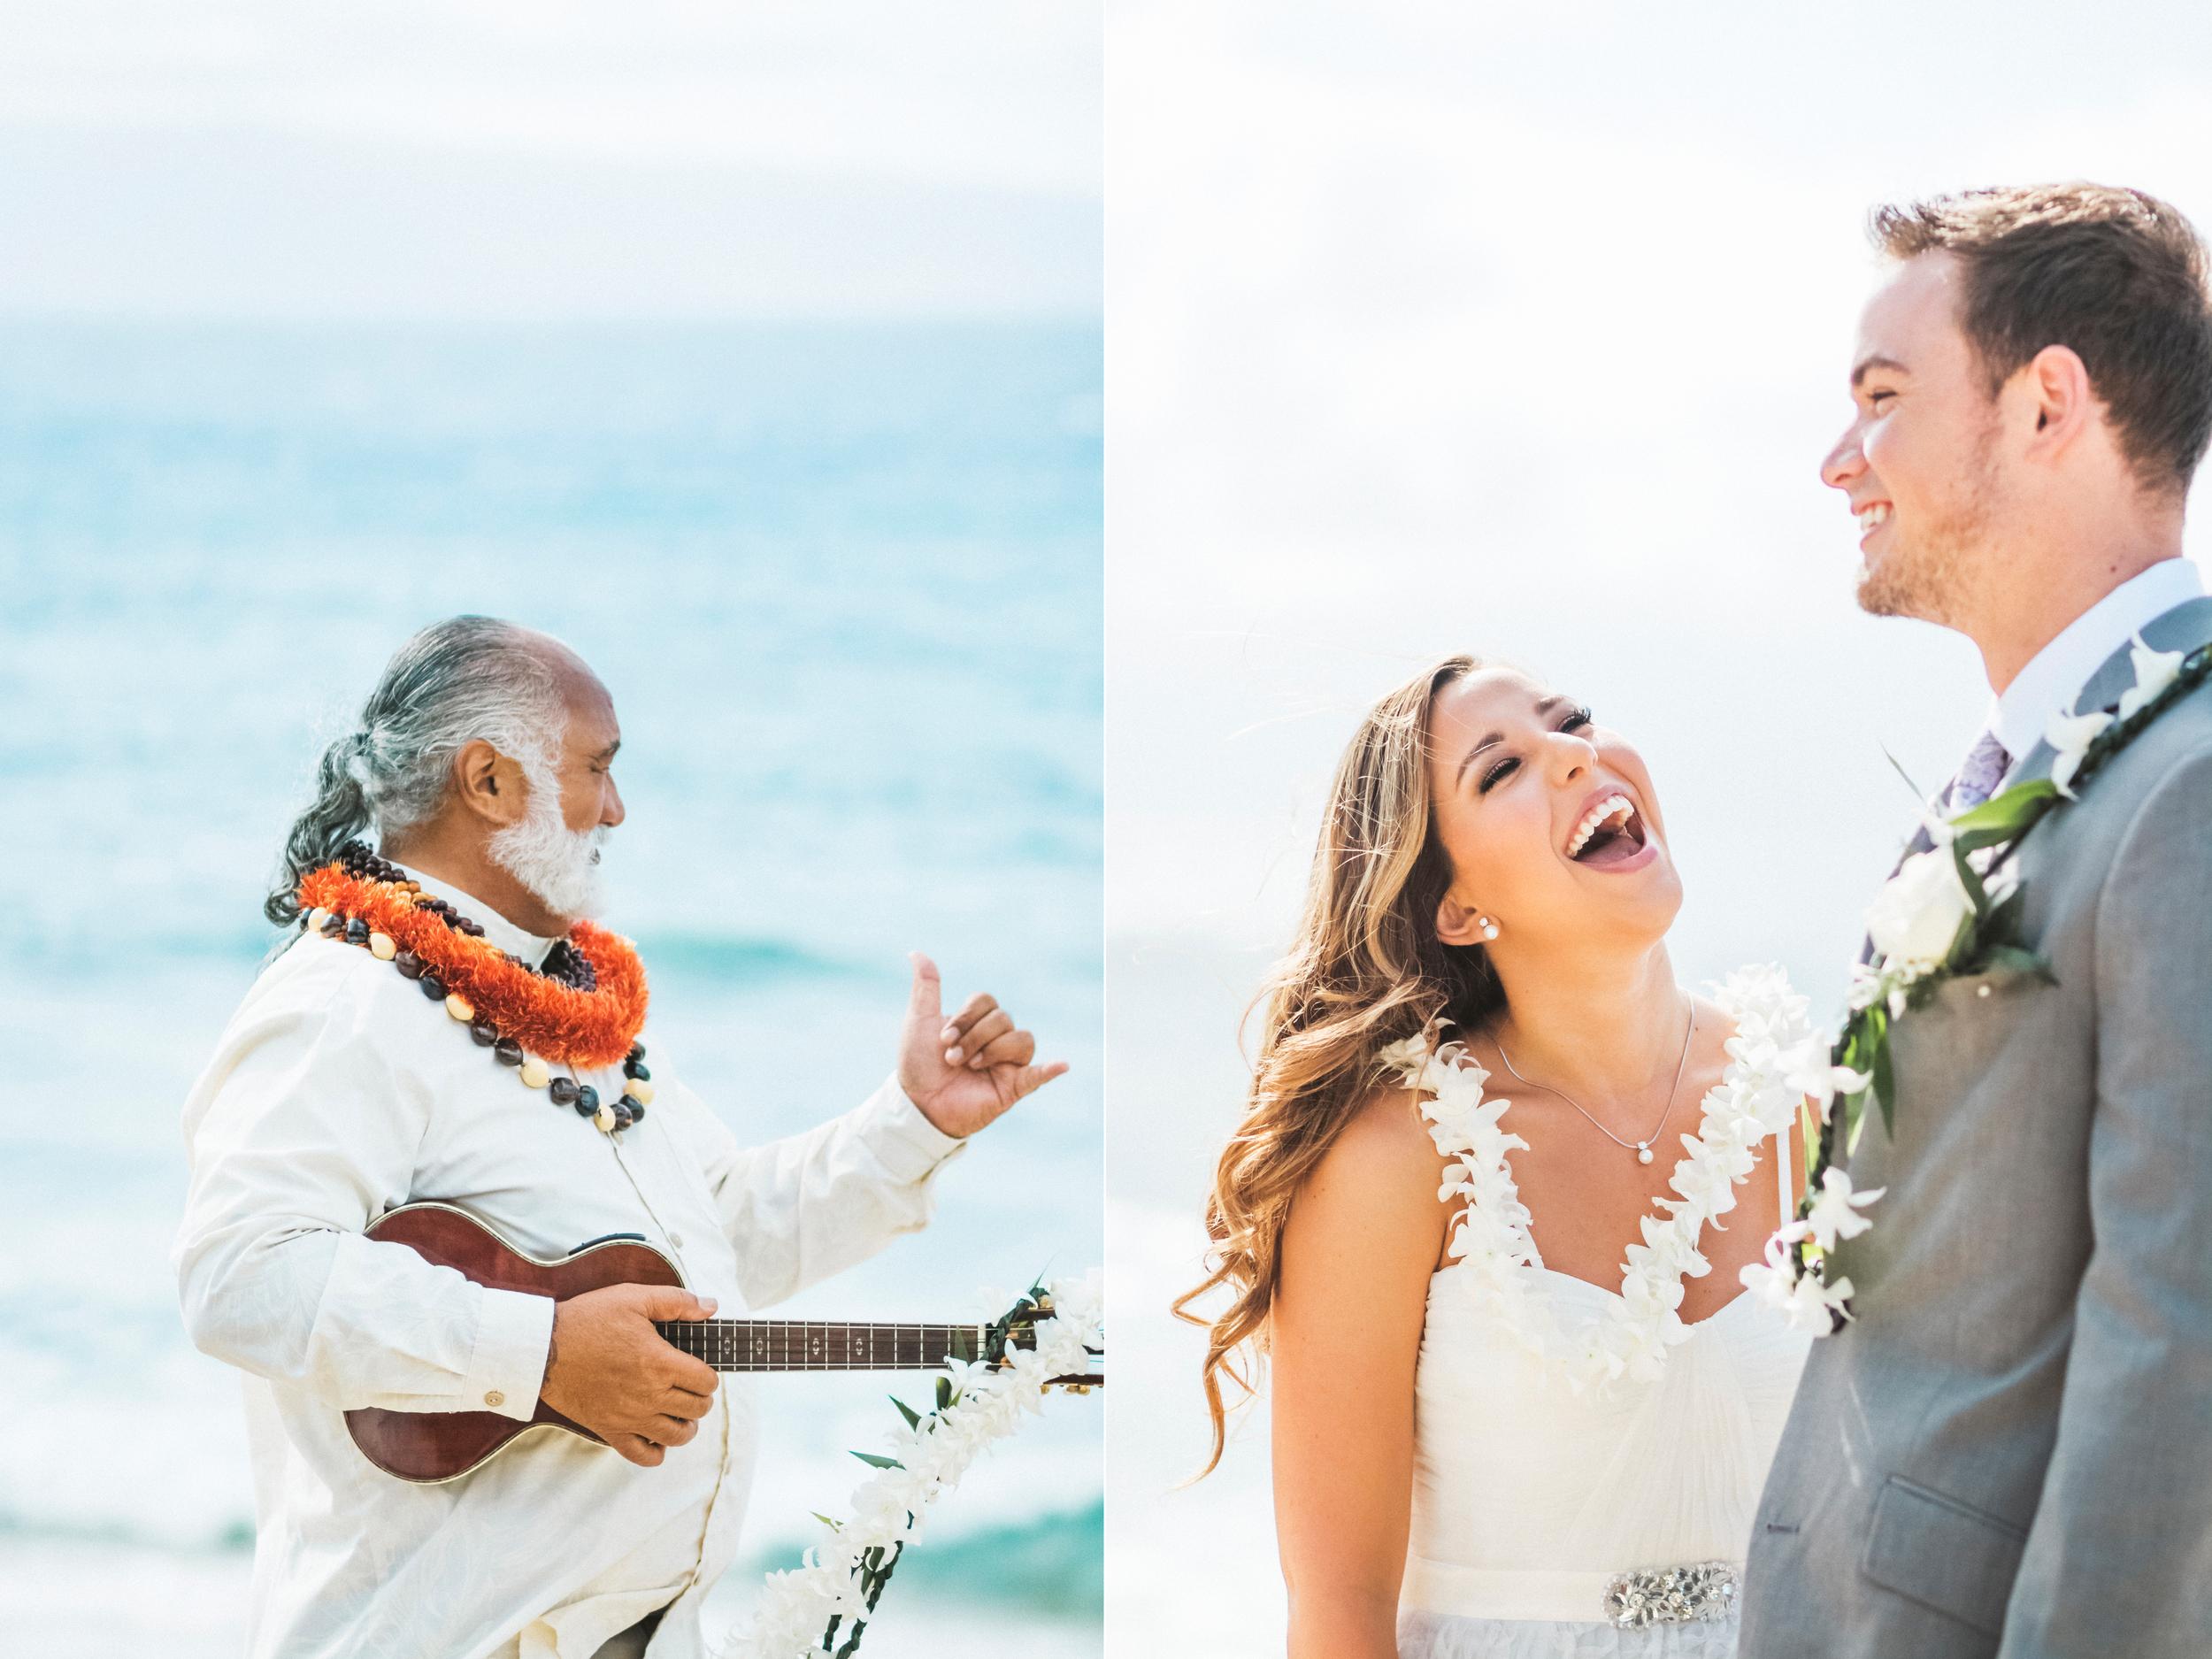 angie-diaz-photography-maui-ironwoods-beach-wedding-3.jpg